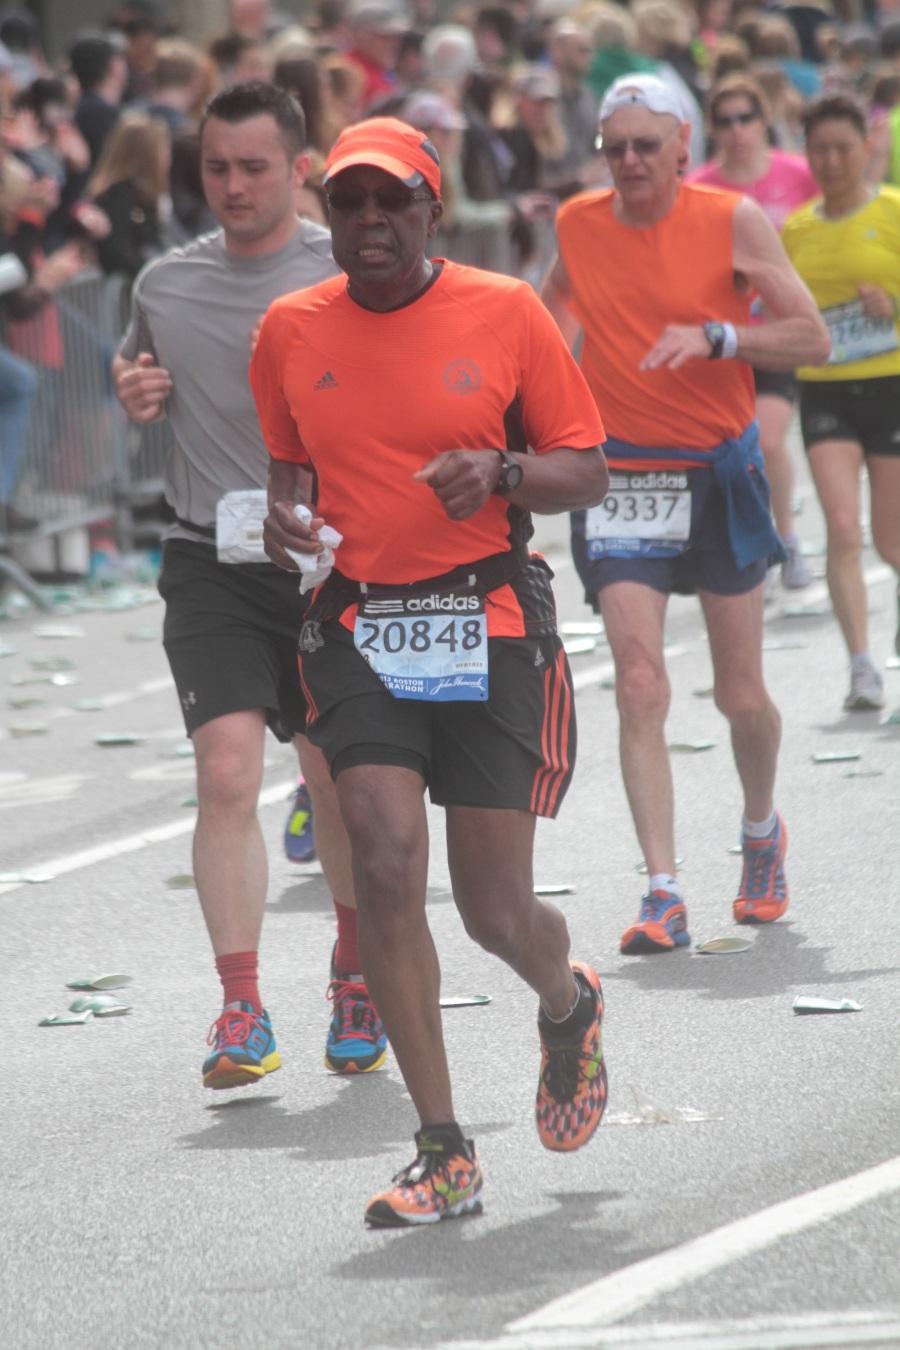 boston marathon 2013 number 20848